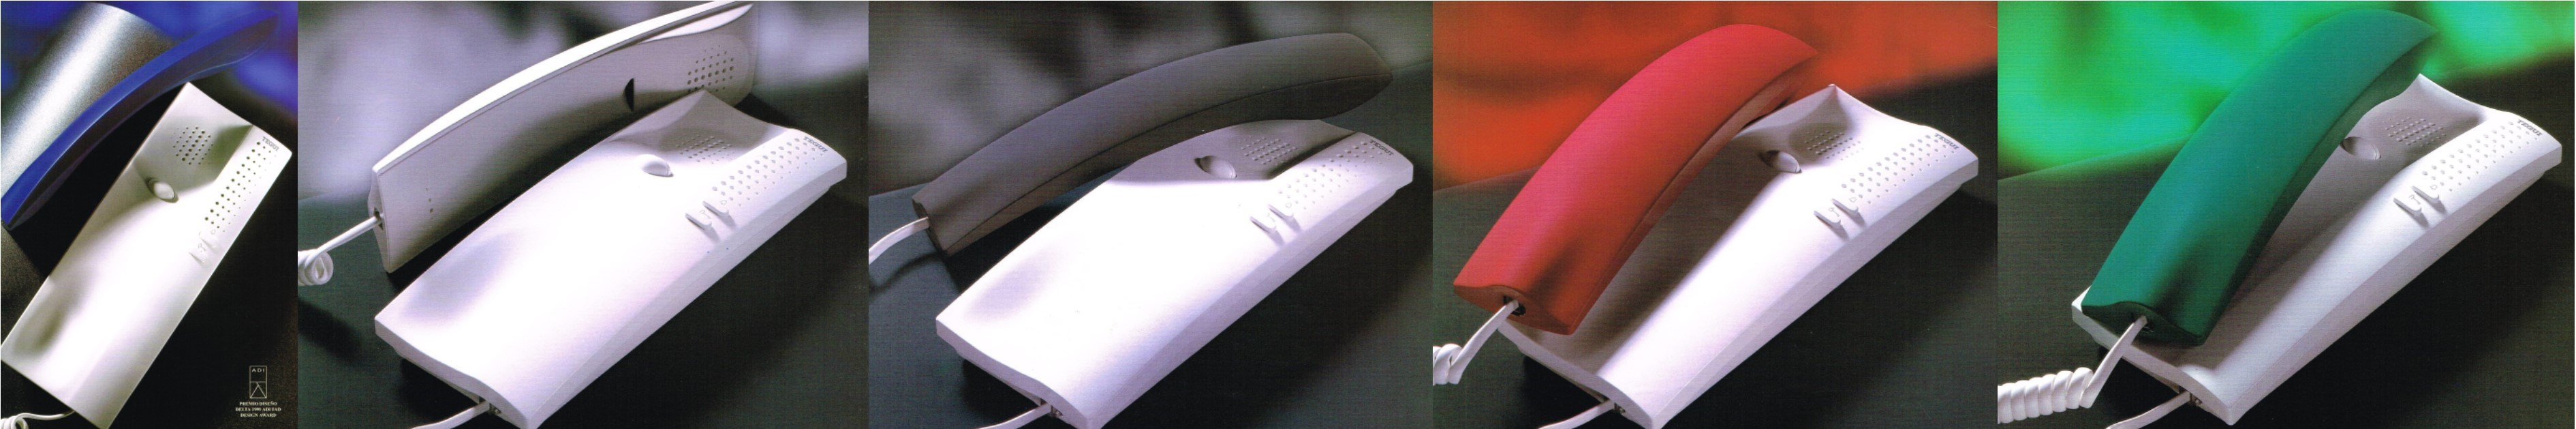 Telefonos Serie 7